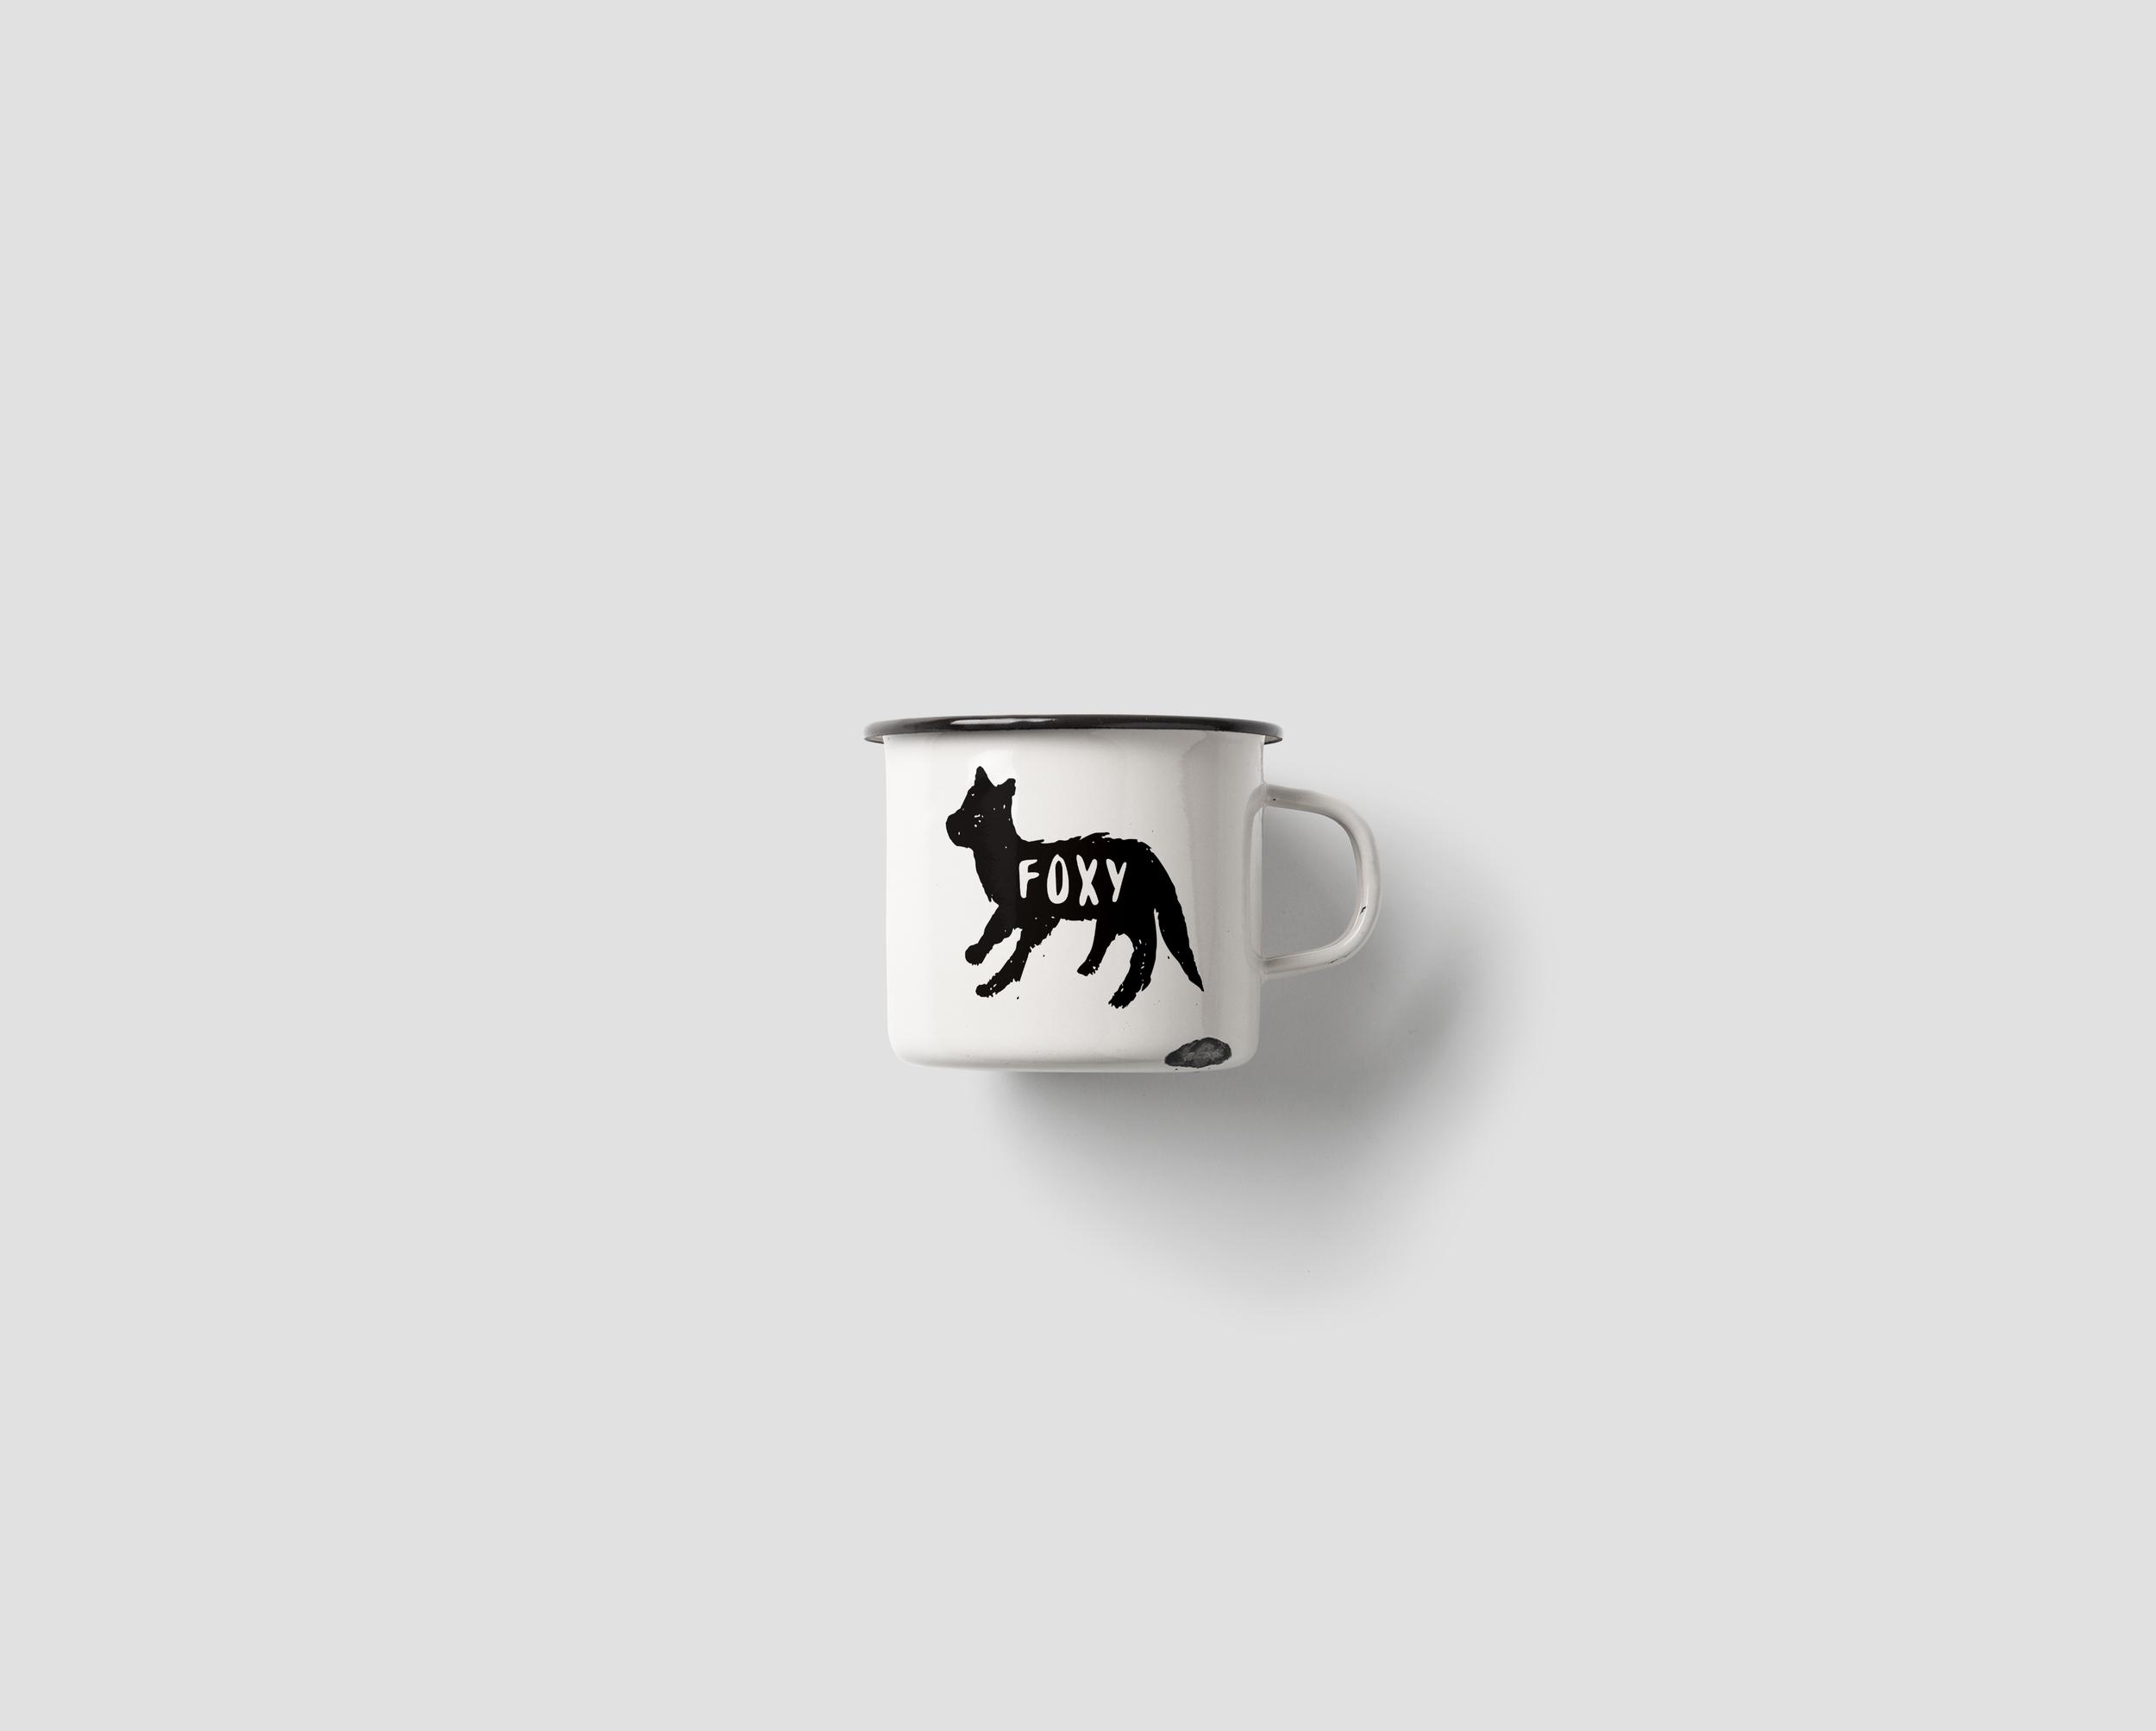 fox mug mock photo.jpg